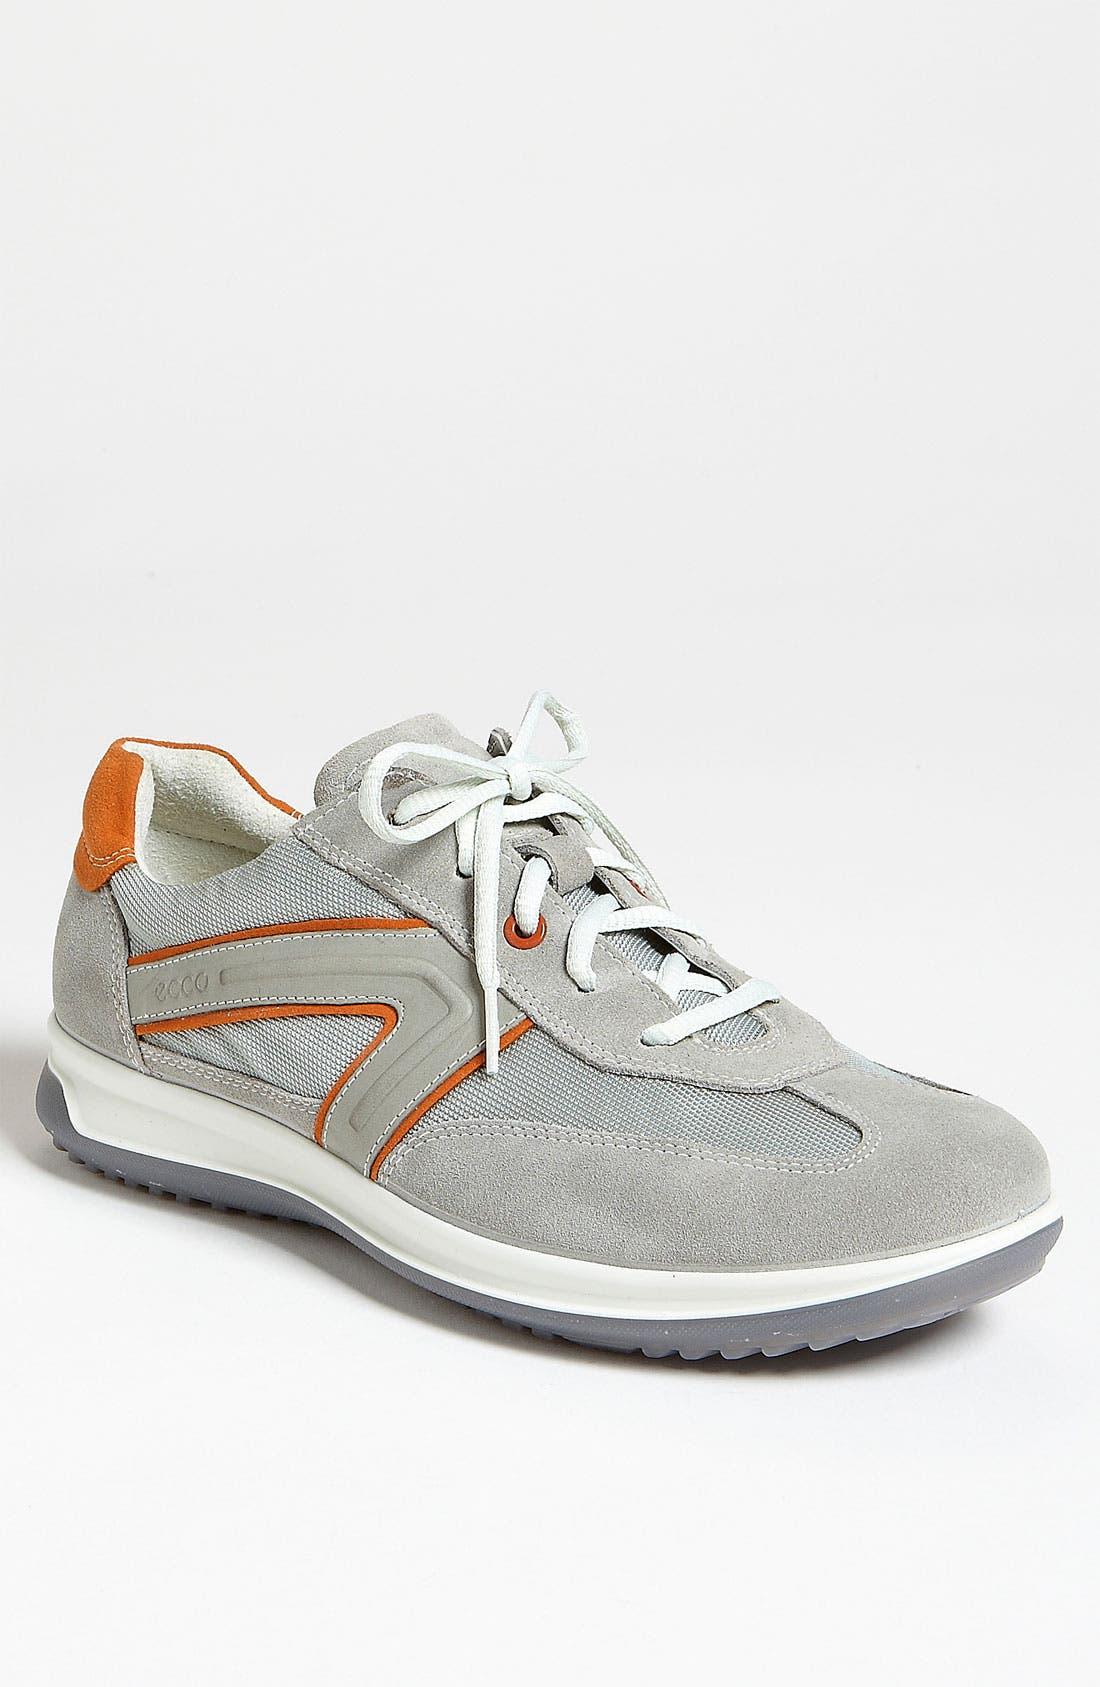 Main Image - ECCO 'Roadstar' Sneaker